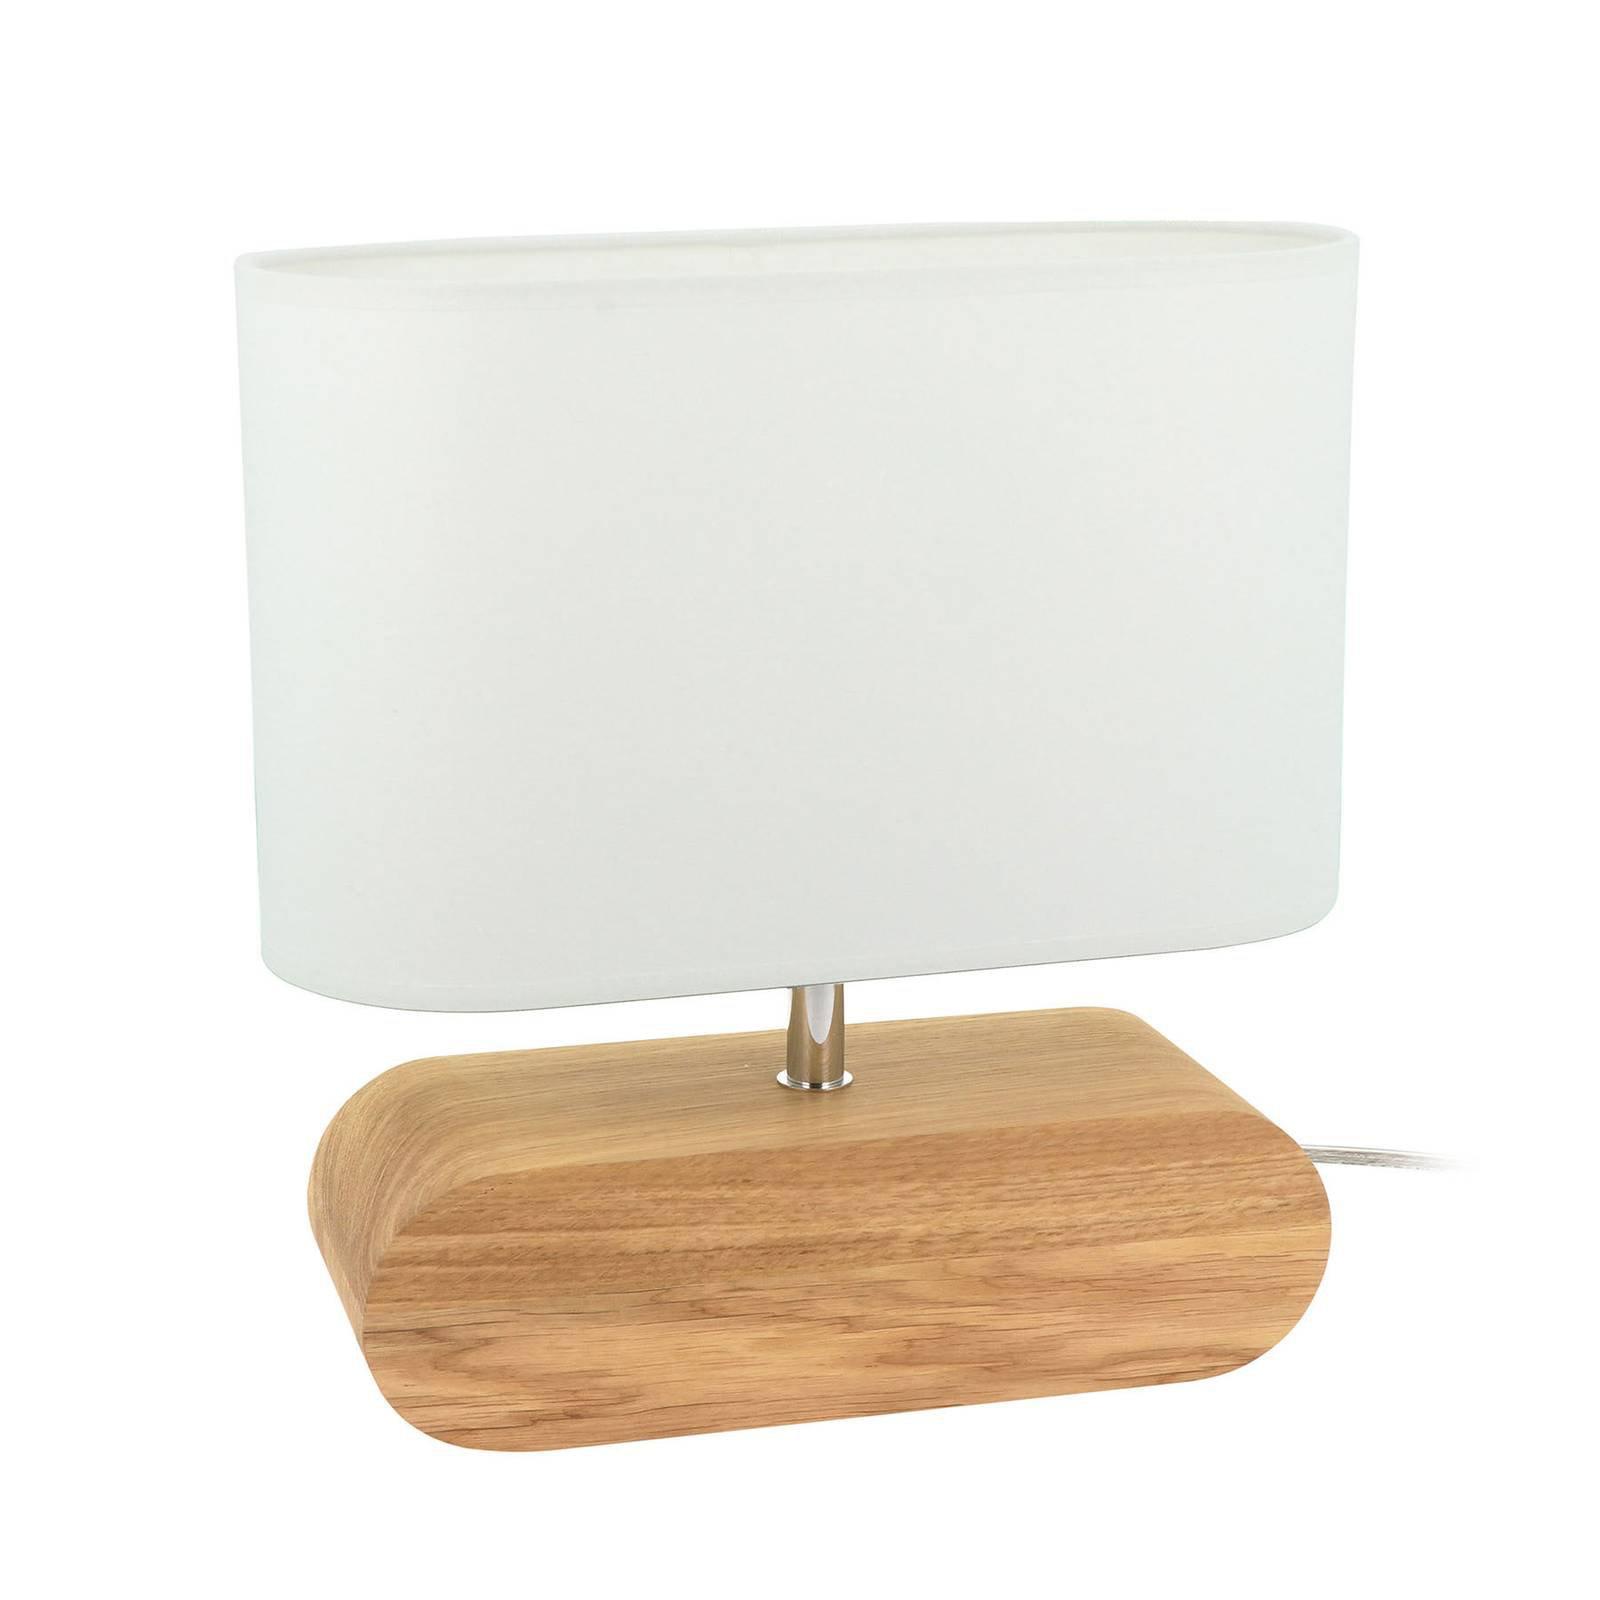 Bordlampe Cassy, eiketre, hvit stoffskjerm